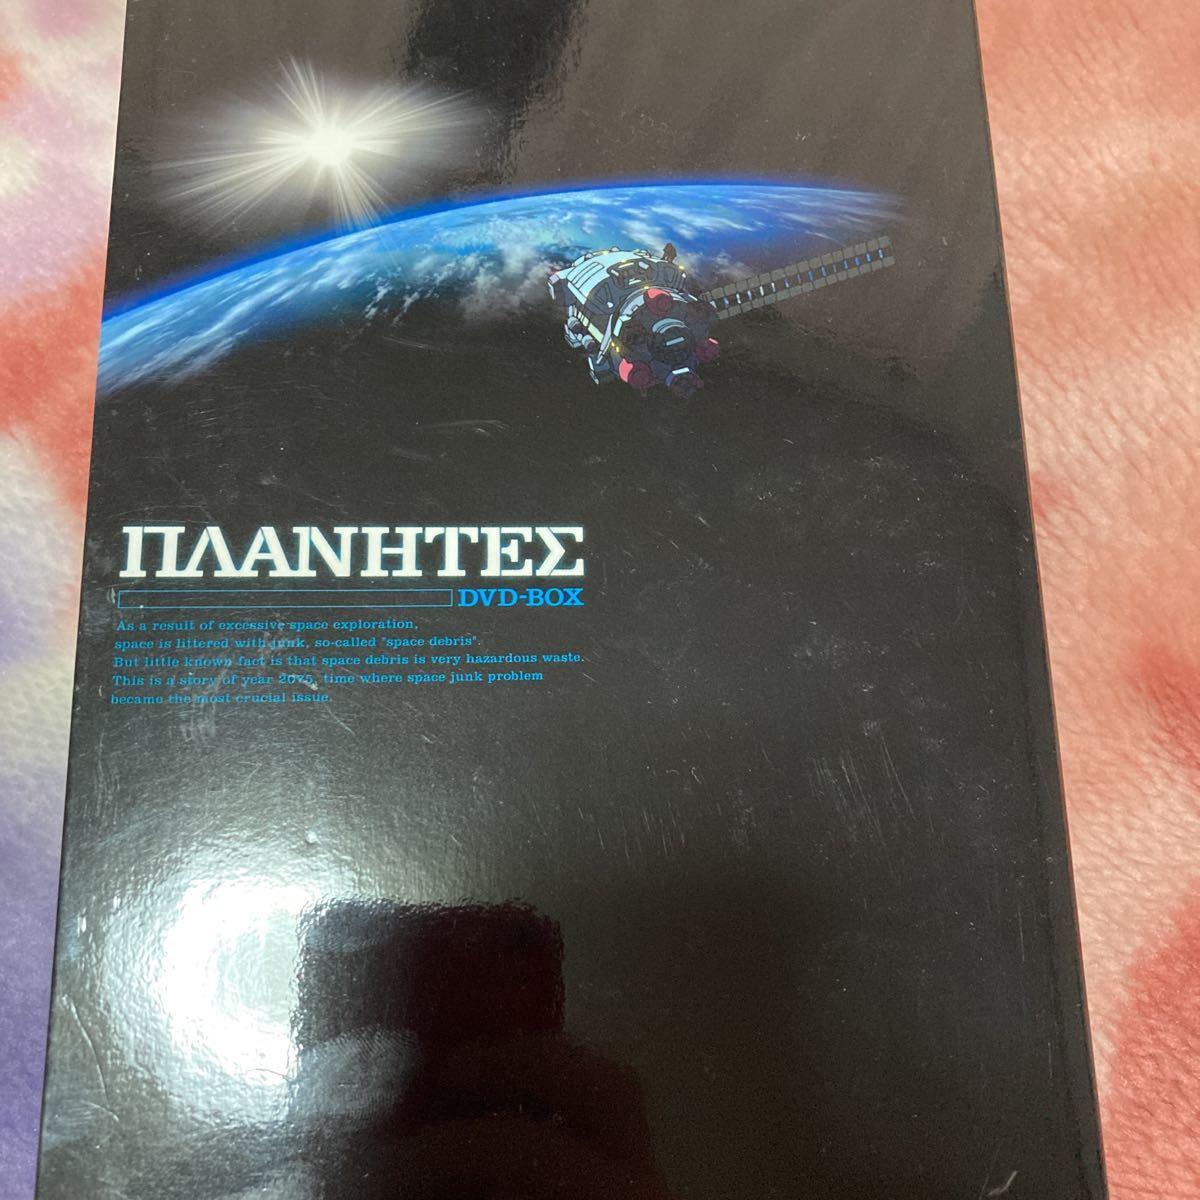 DVD EMOTION the Best プラネテス 未使用に近いDVD-BOX 正規品